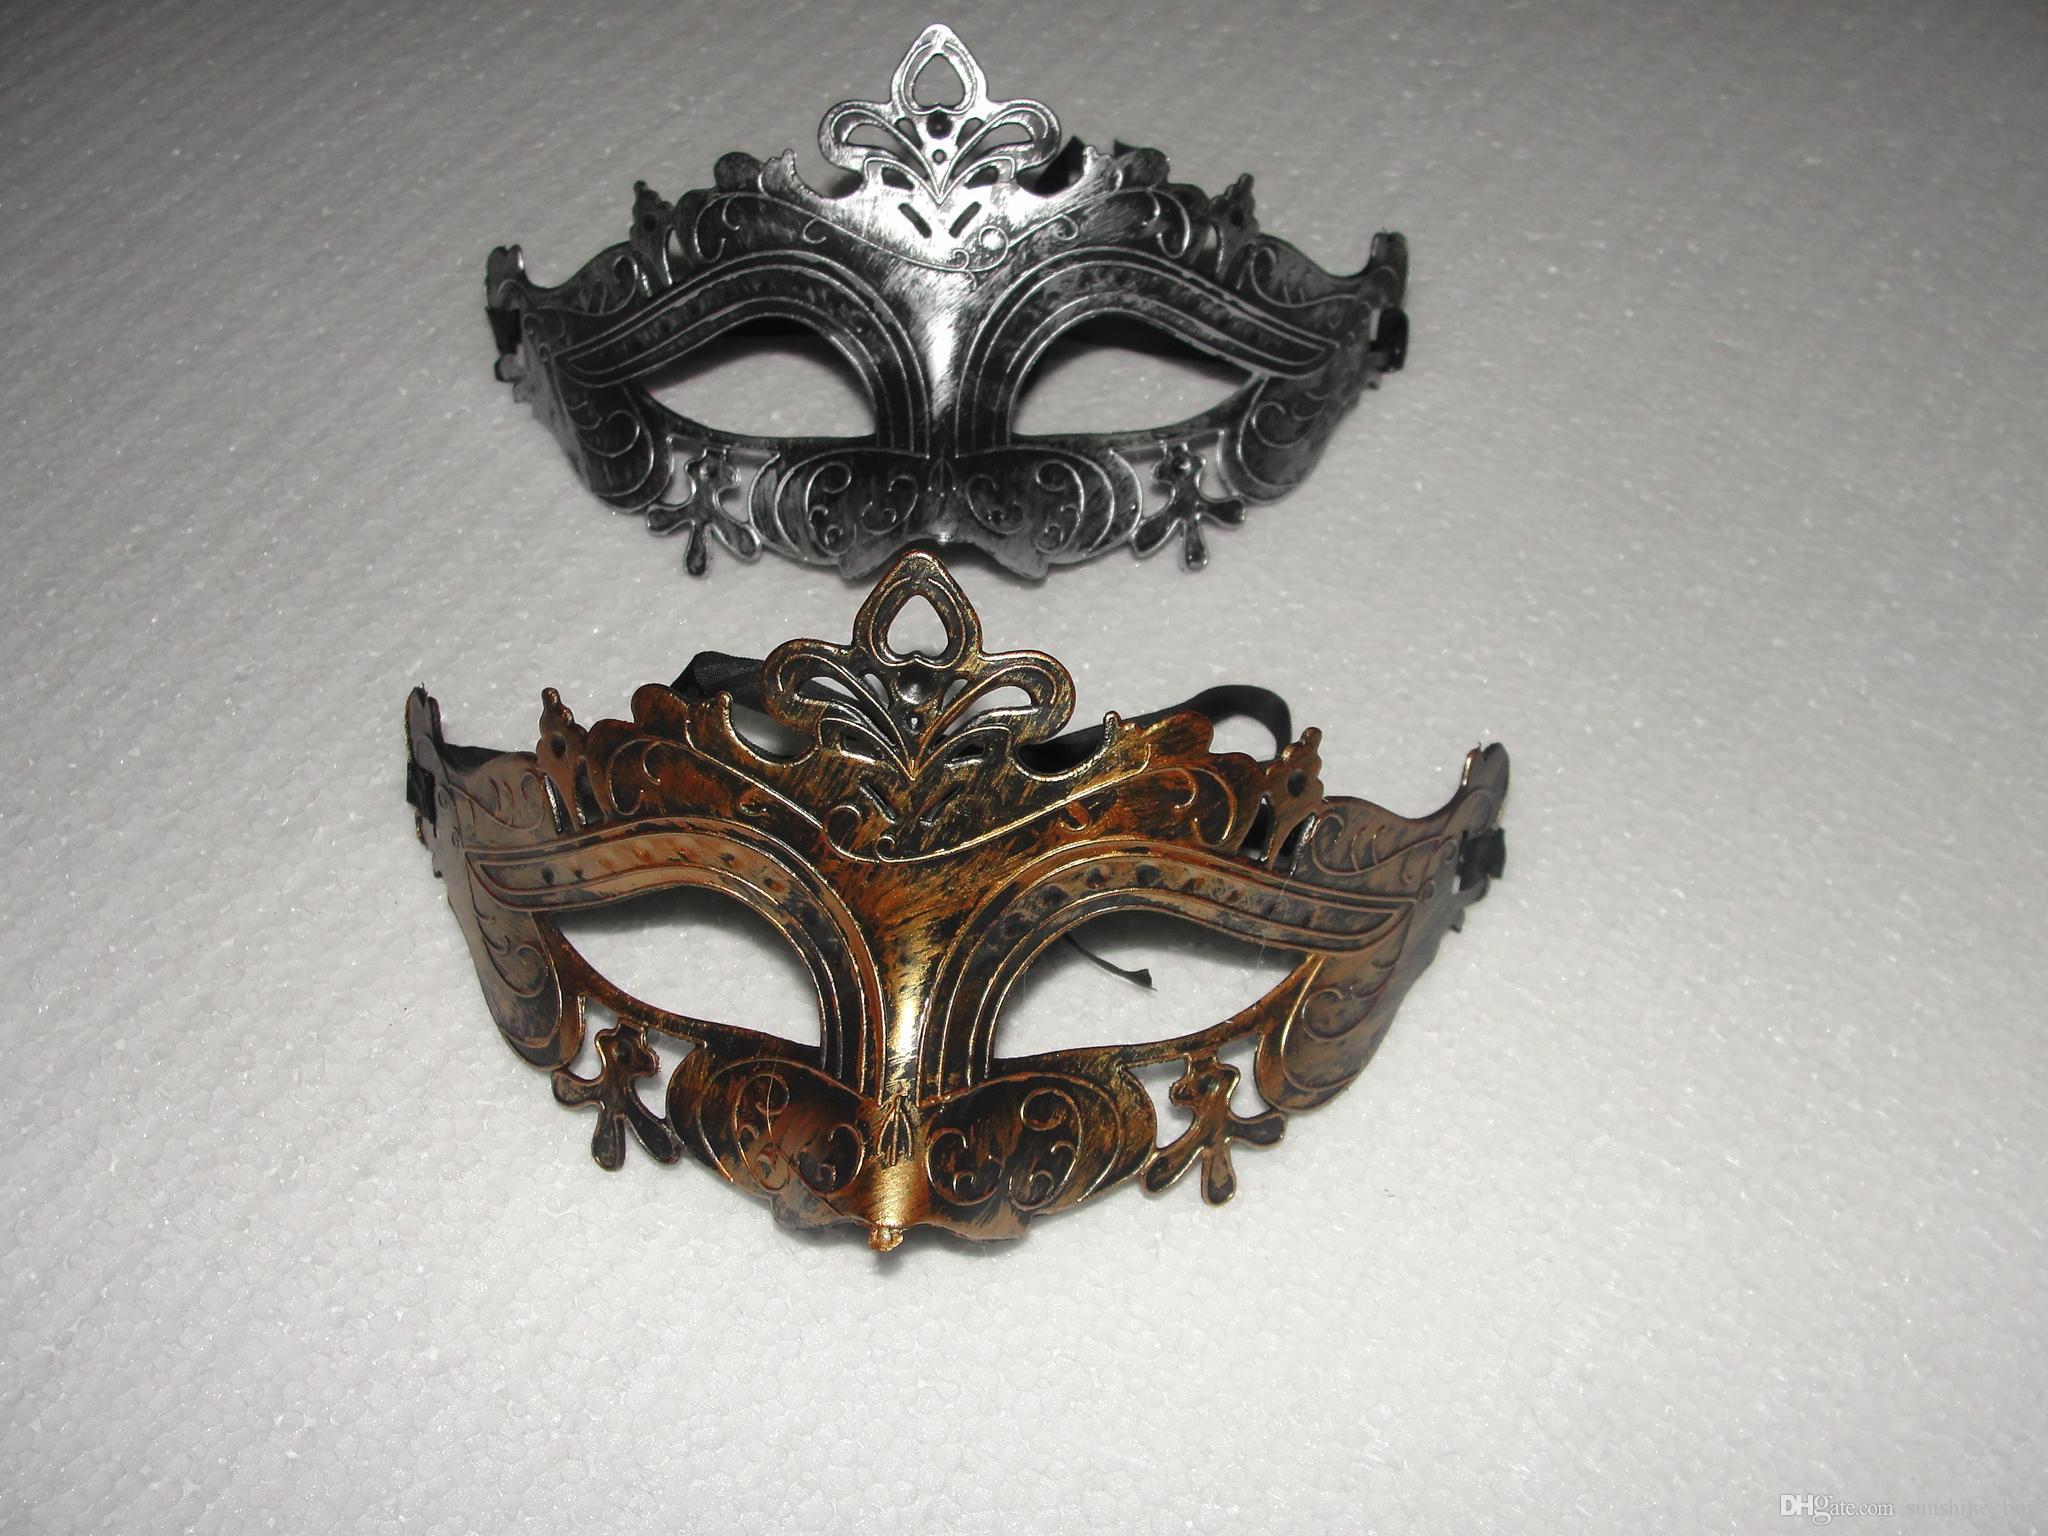 Maschera Mens greco retrò Mardi Gras Mascherata Gladiator Maschera d'oro / argento d'argento Maschera di carnevale d'argento